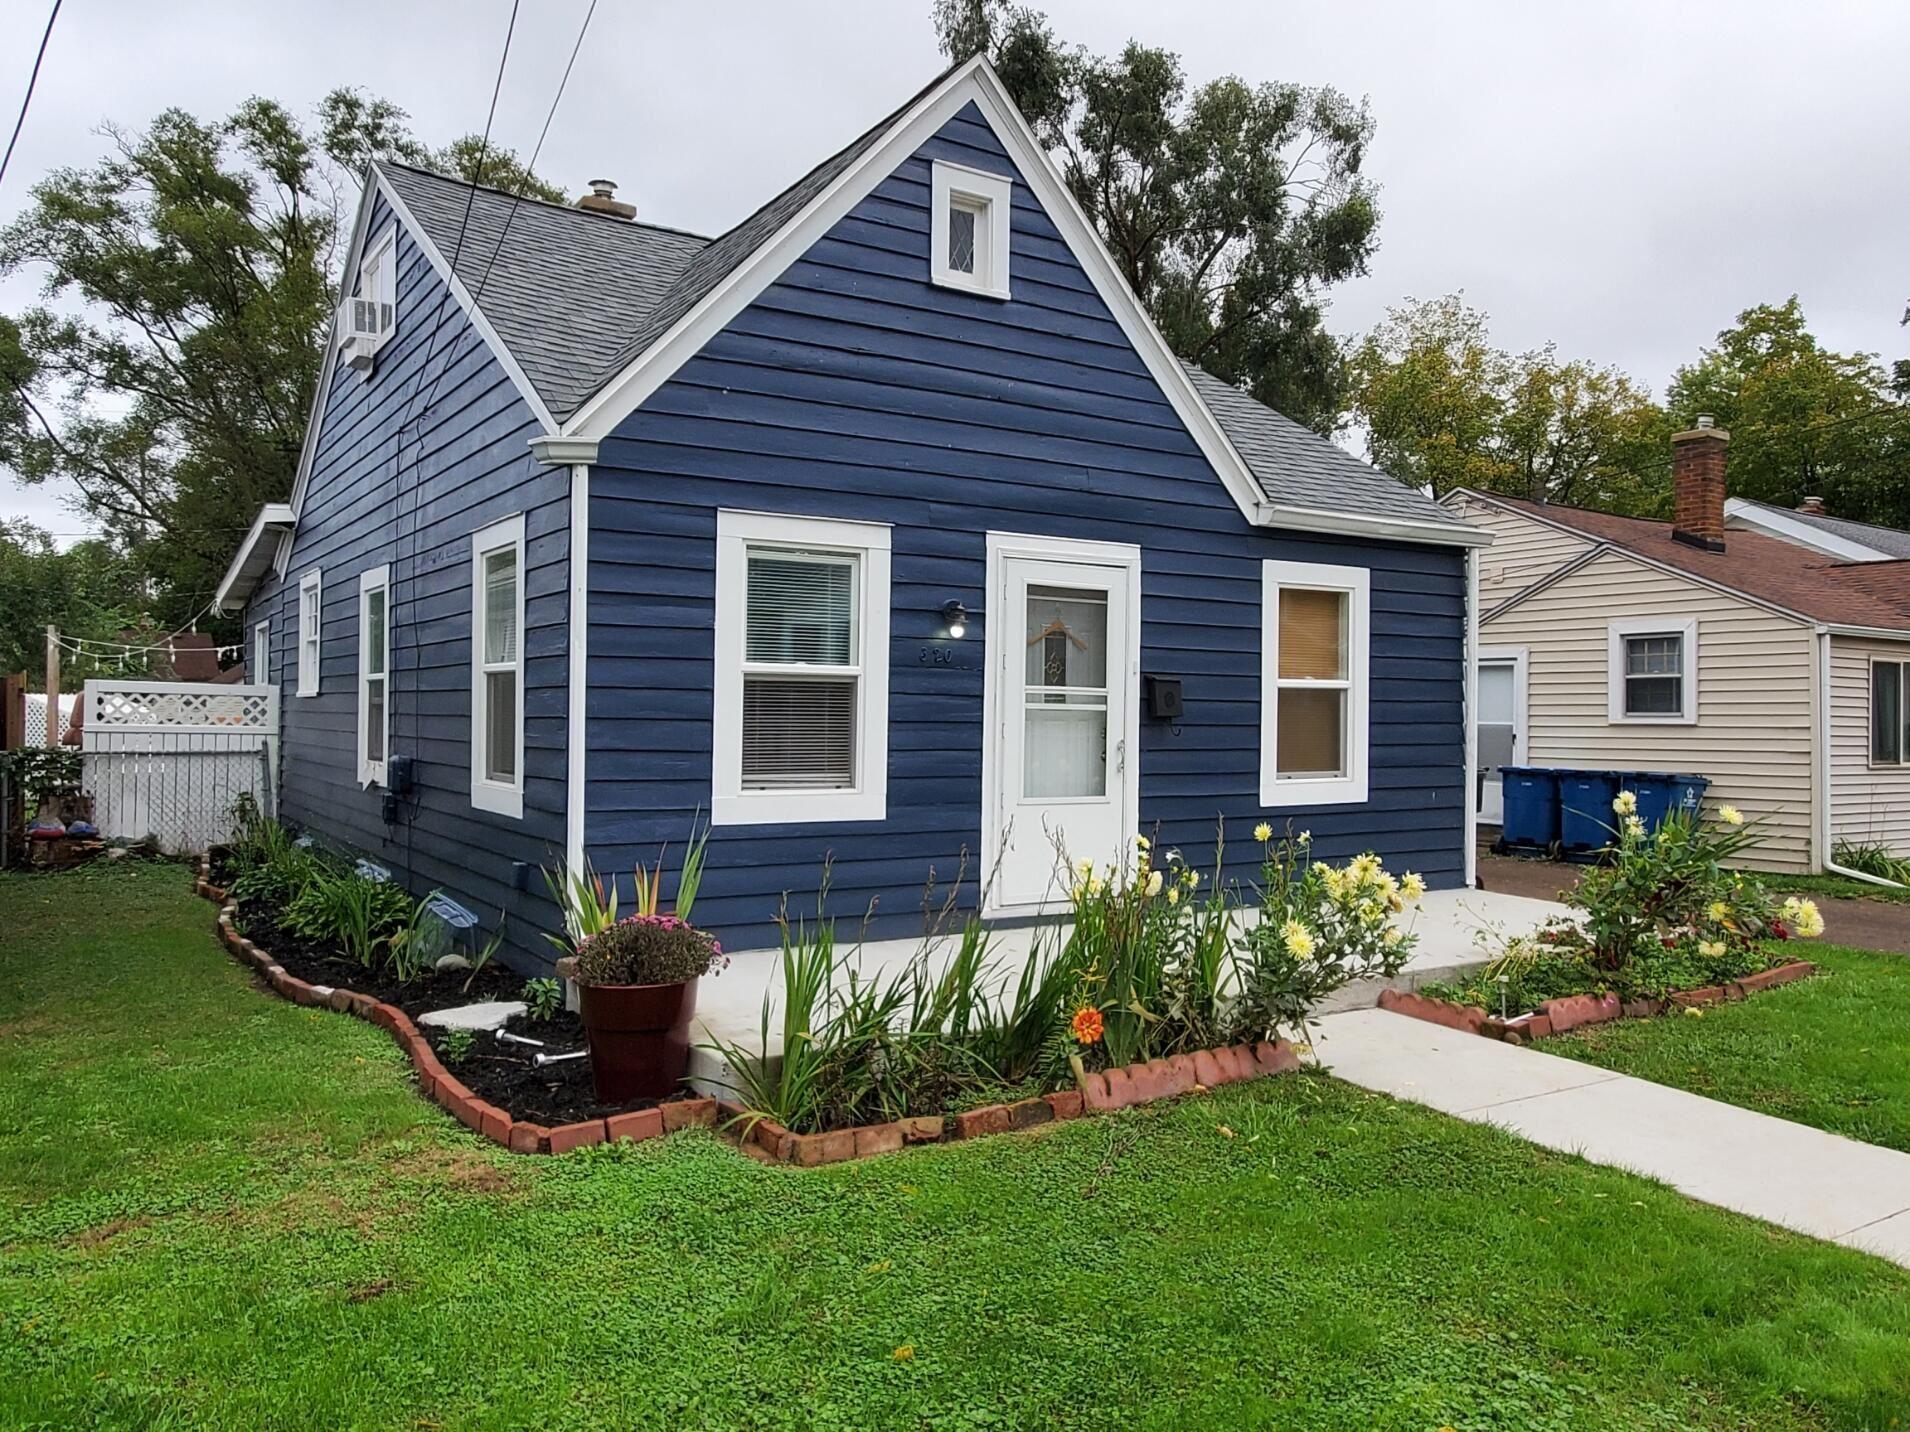 320 Wentworth Avenue, Battle Creek, MI 49015 - MLS#: 21110365